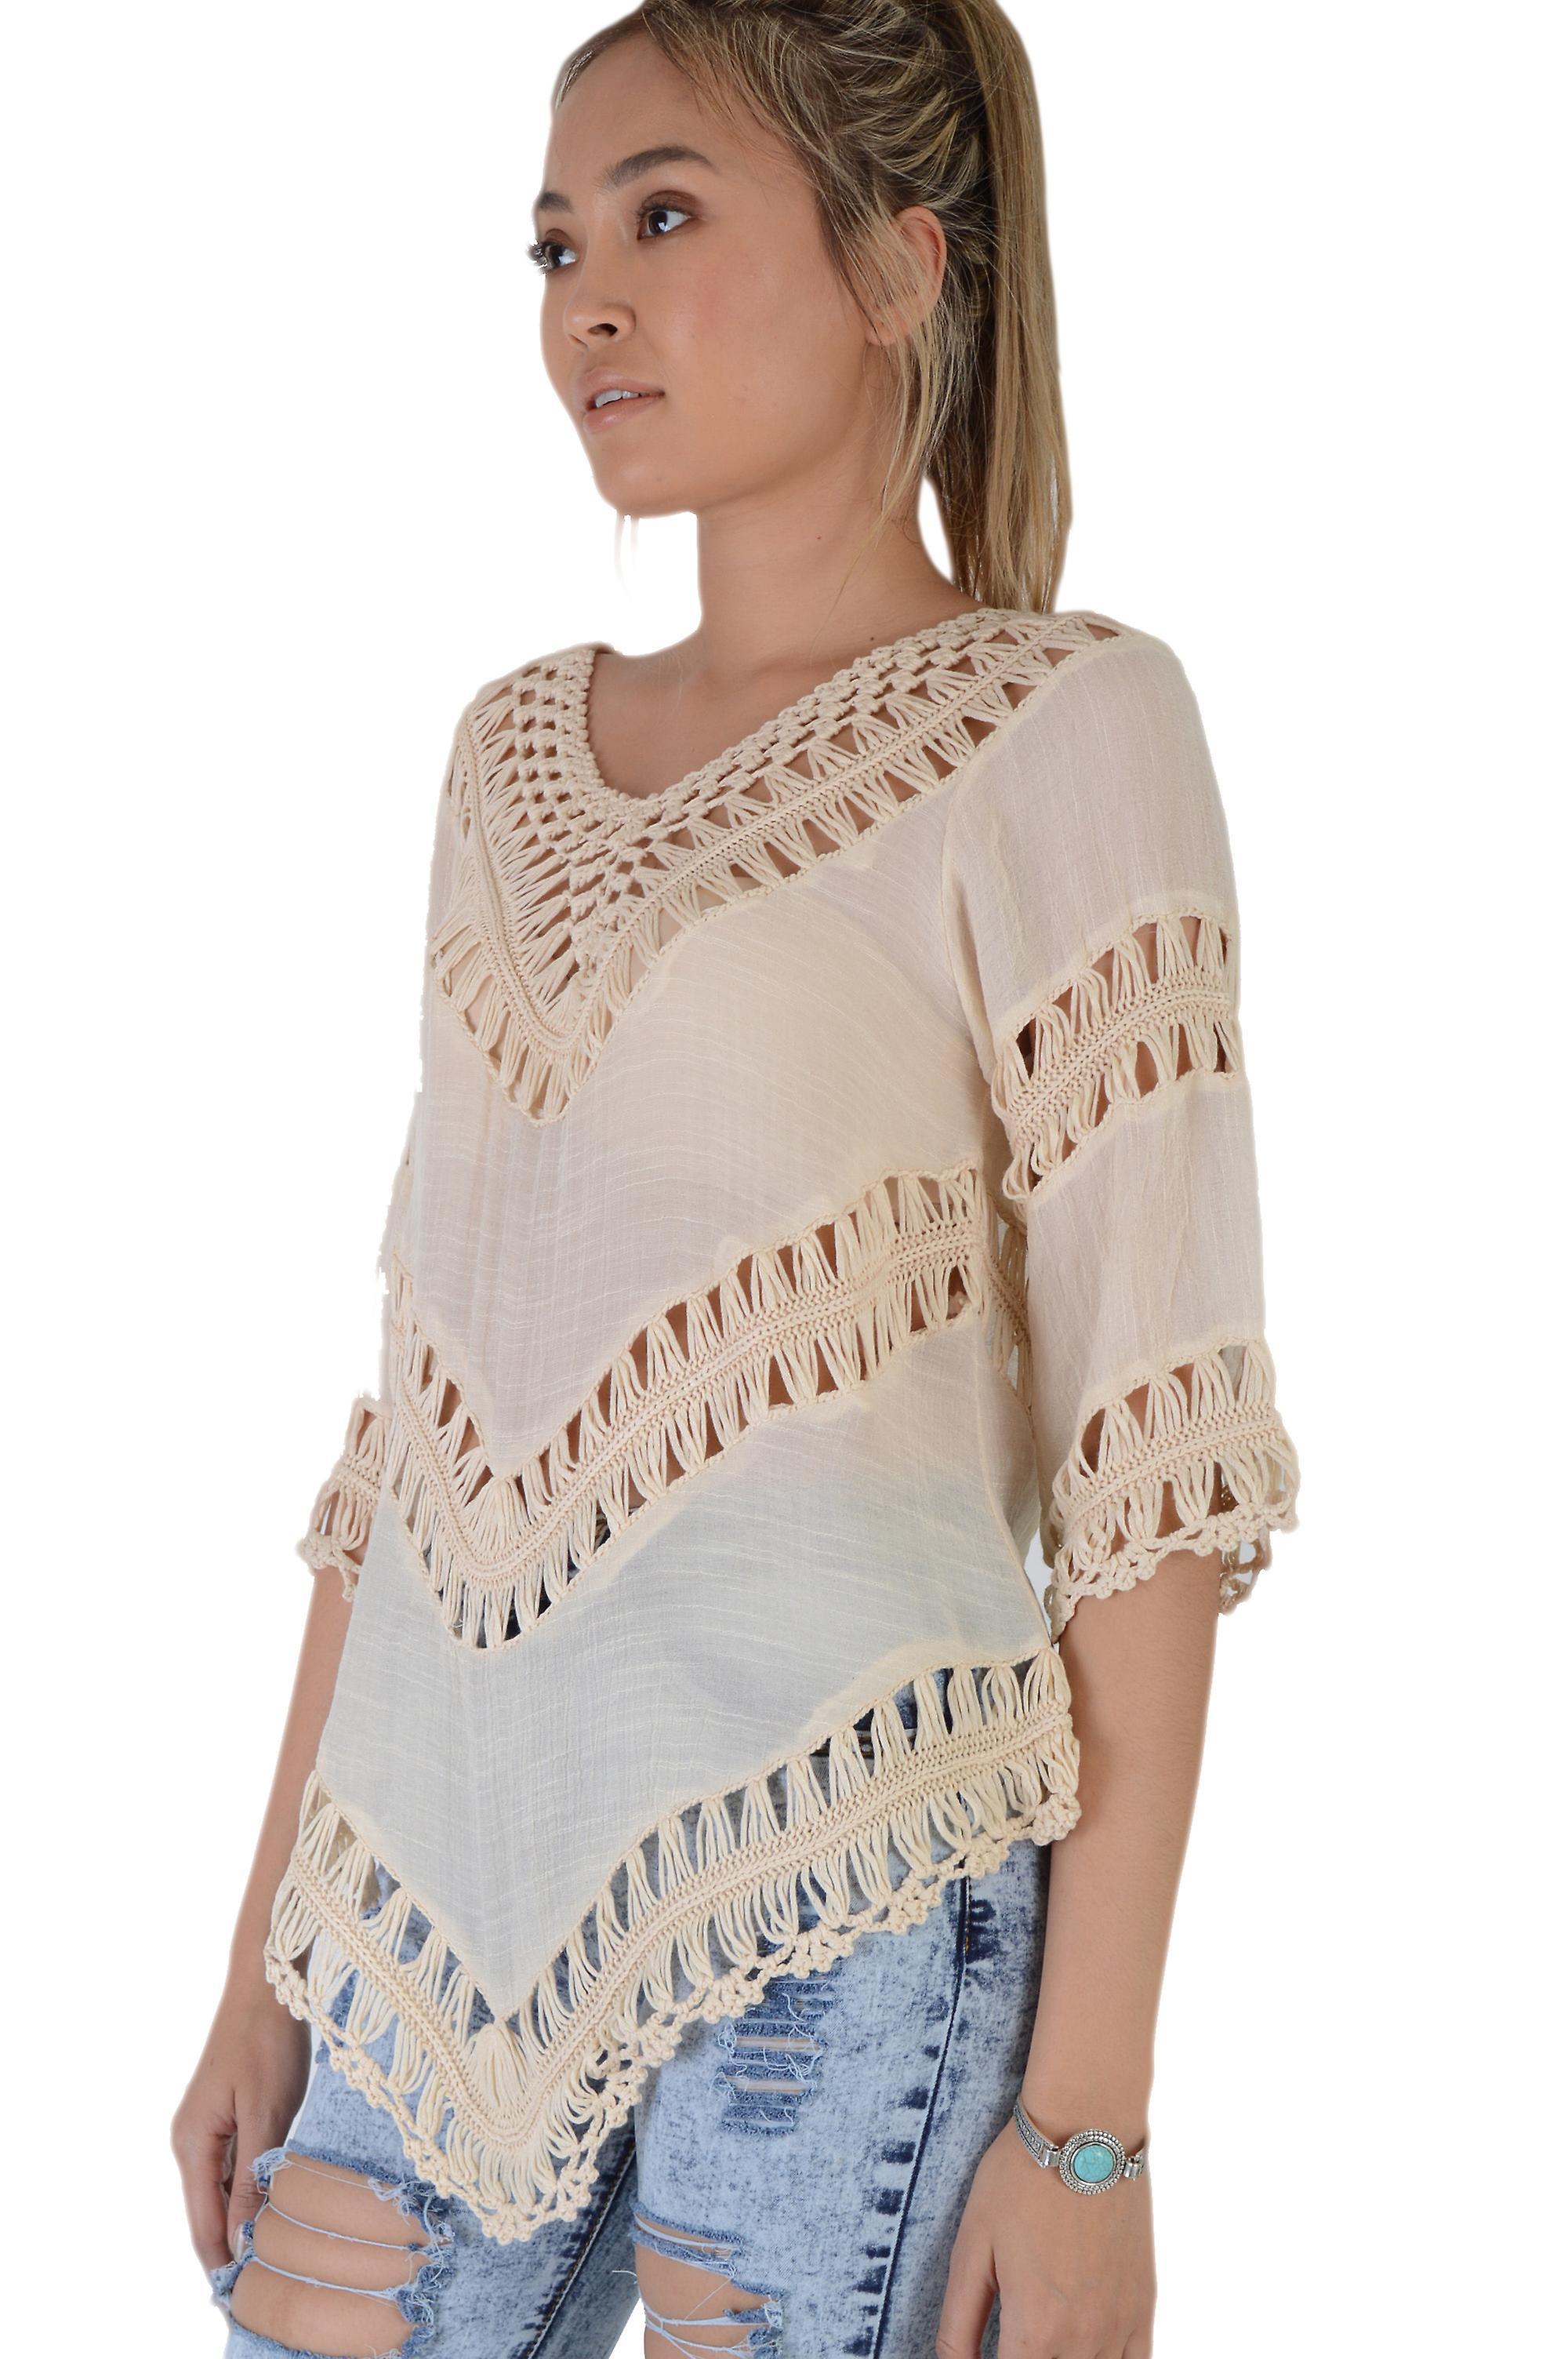 Lovemystyle Lace Crochet Insert Nude Kimono Style Top - SAMPLE